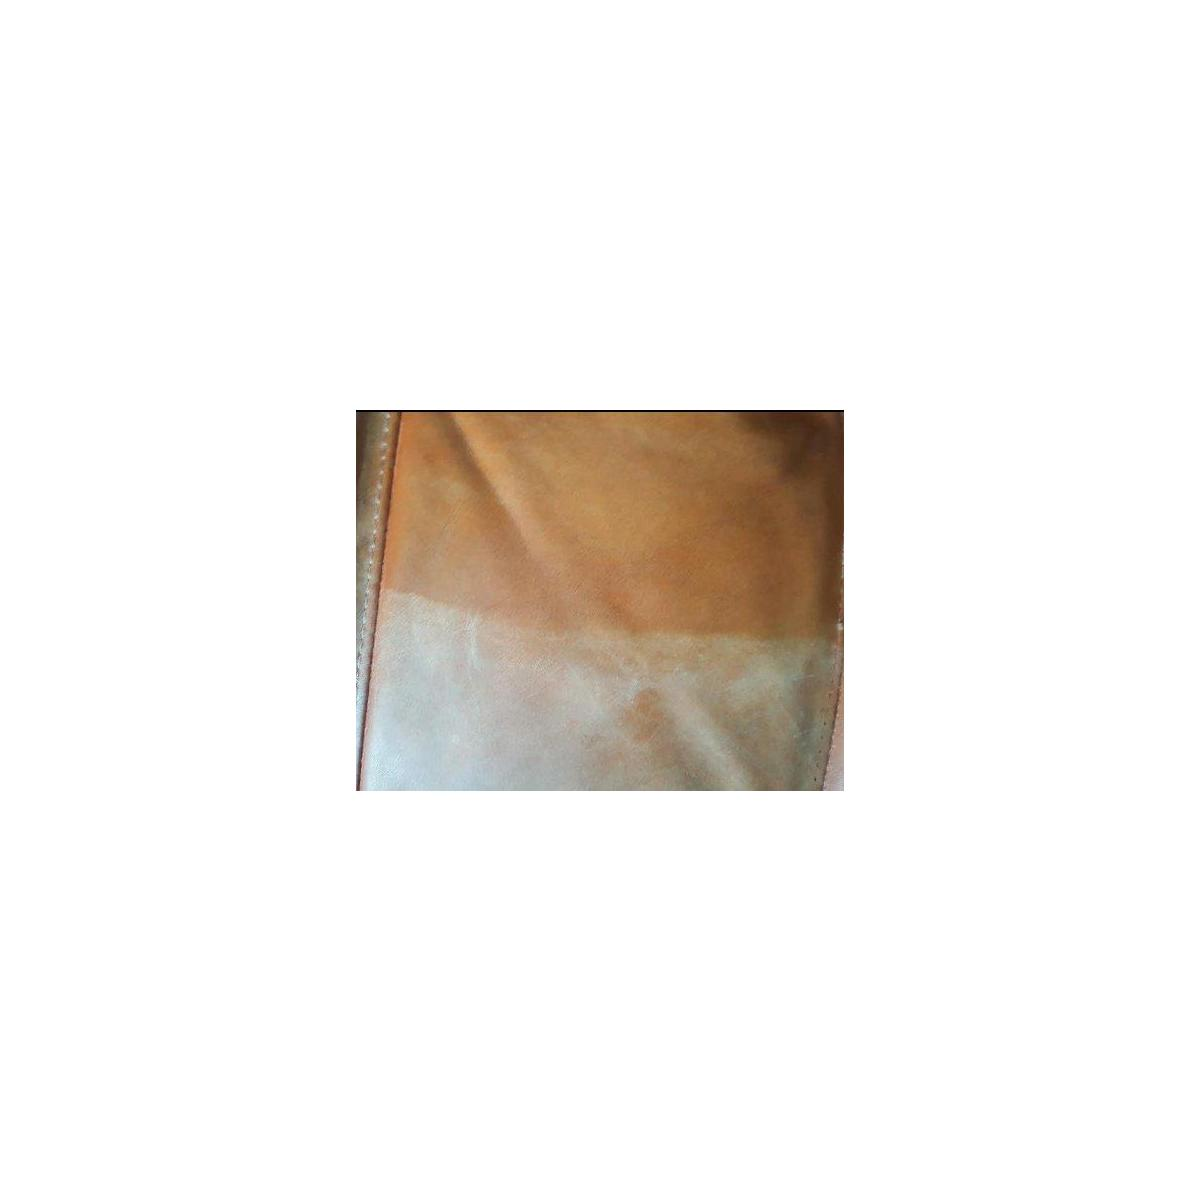 Limit 1 Per Amazon Account - Skidmore's Restoration Cream, 6 Ounce